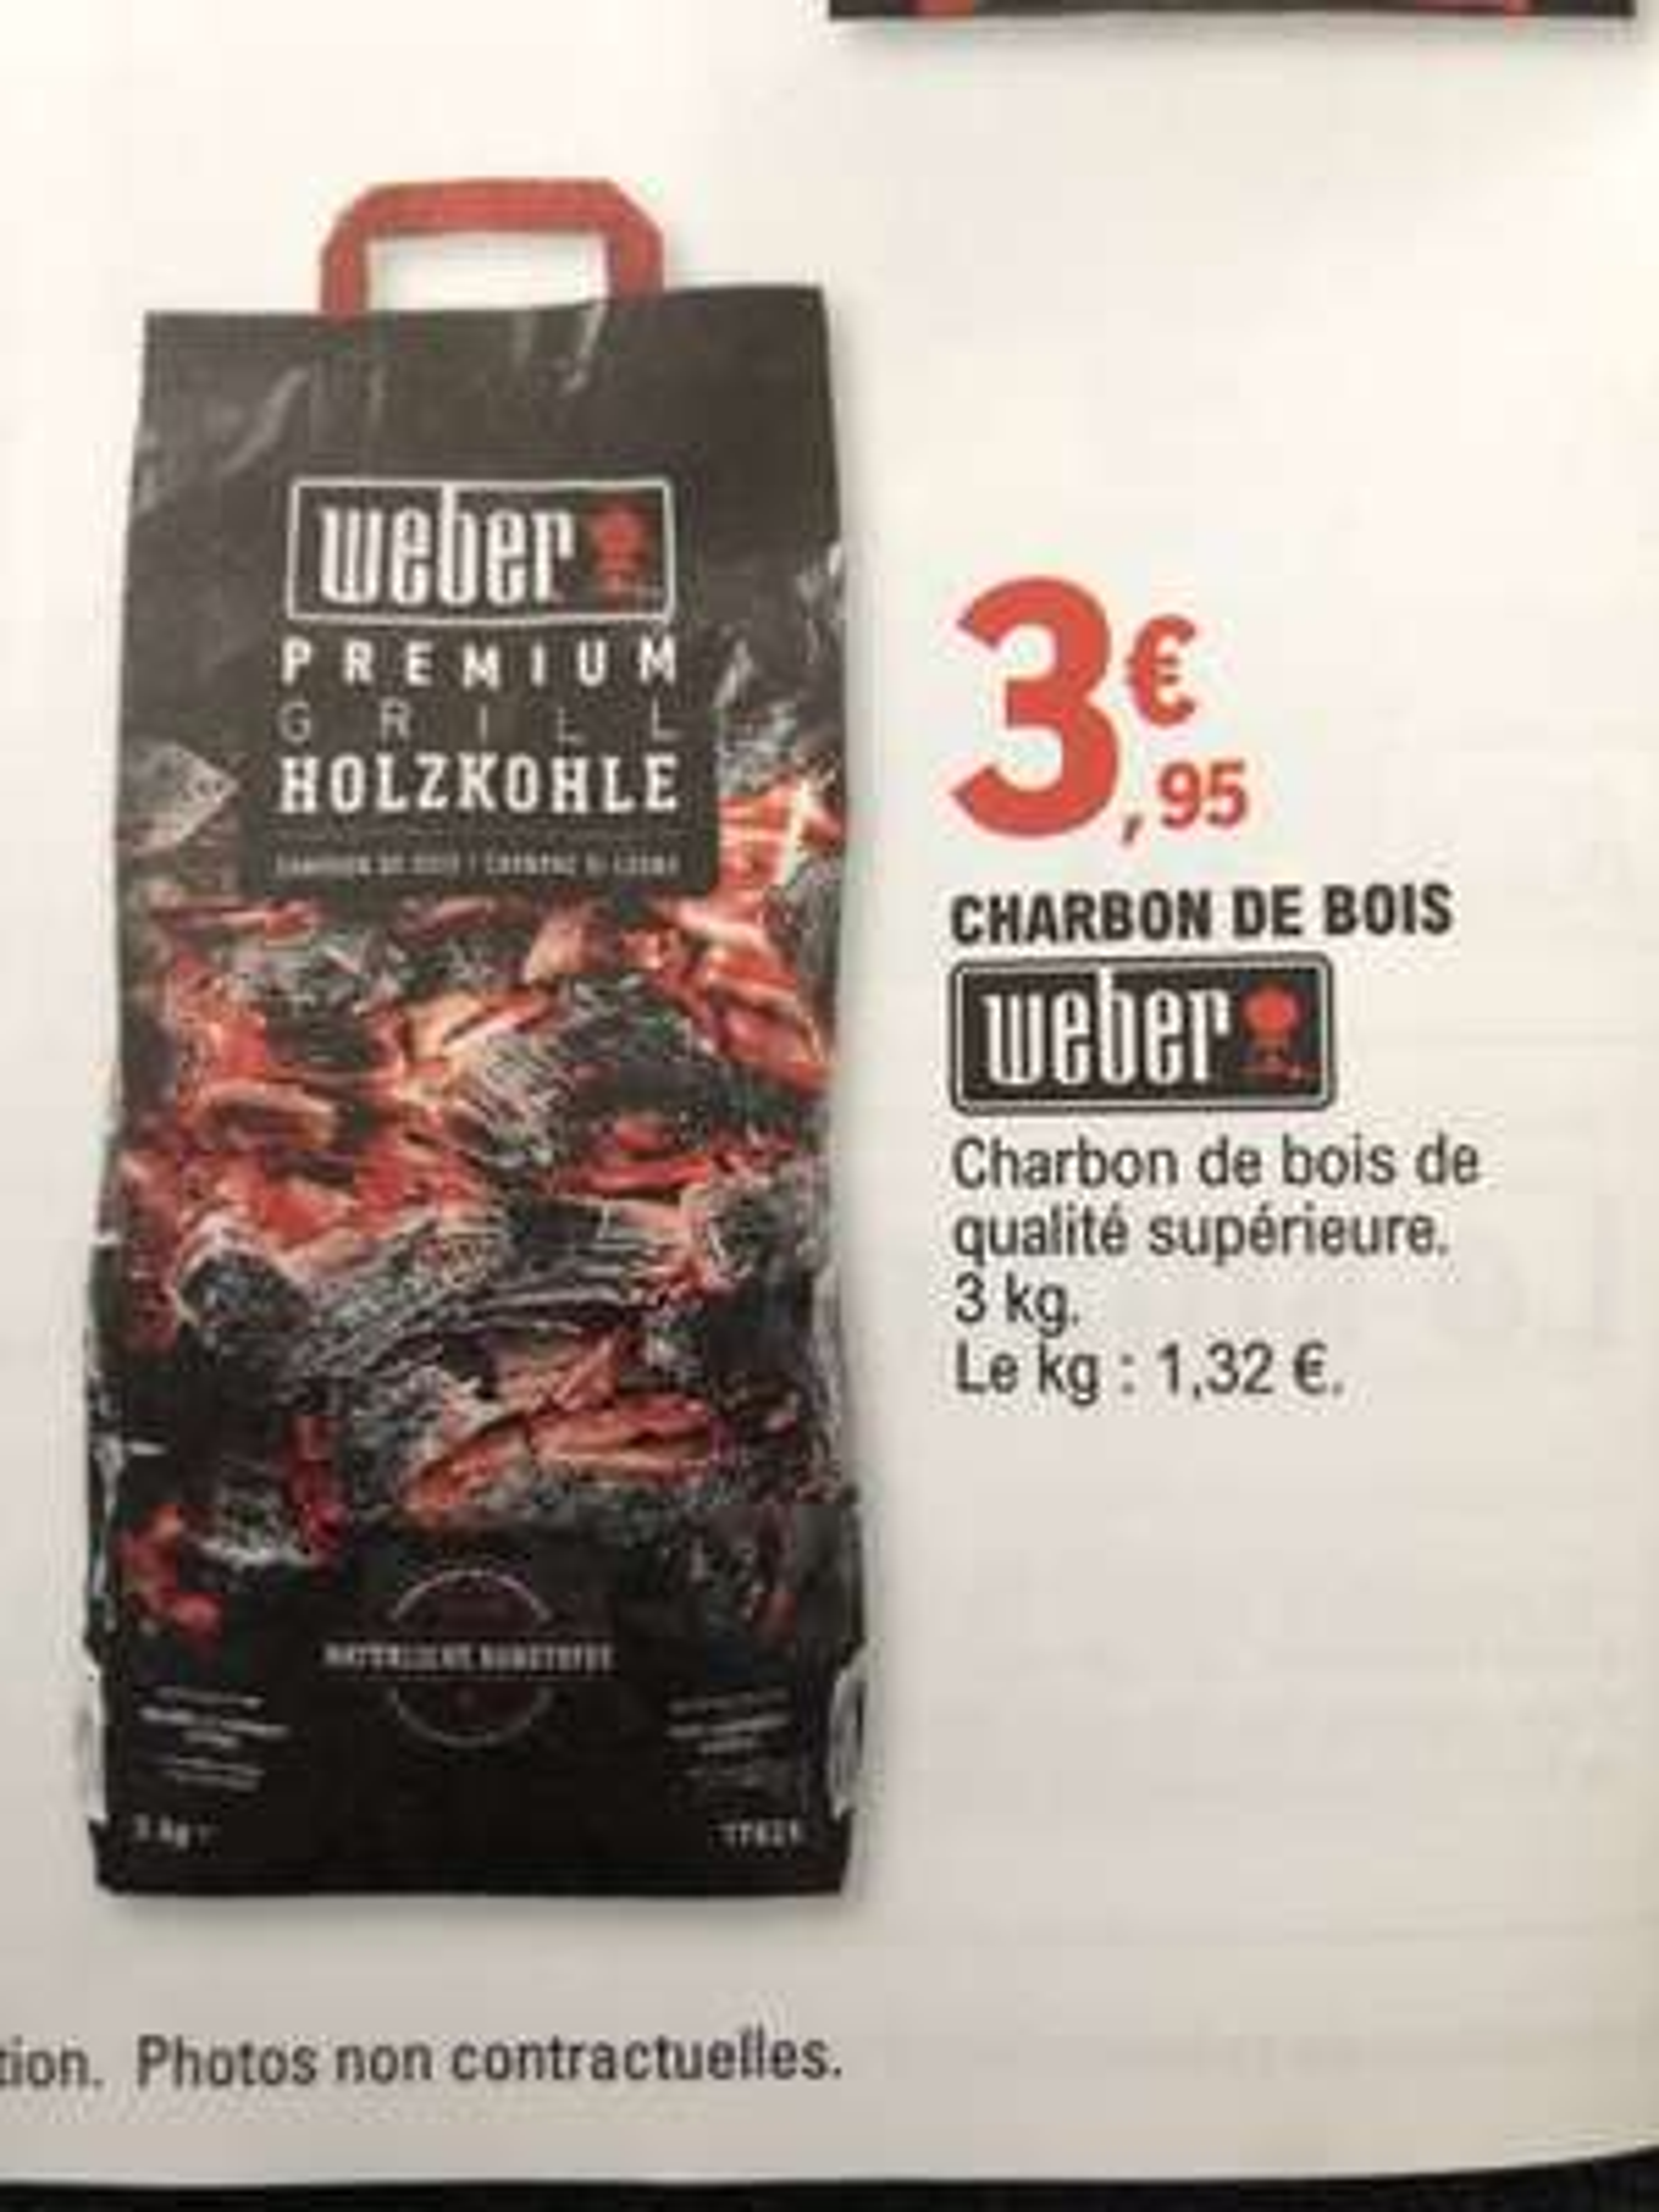 Sac de Charbon de bois Weber 3 kg - Jardi Geispolsheim (67)